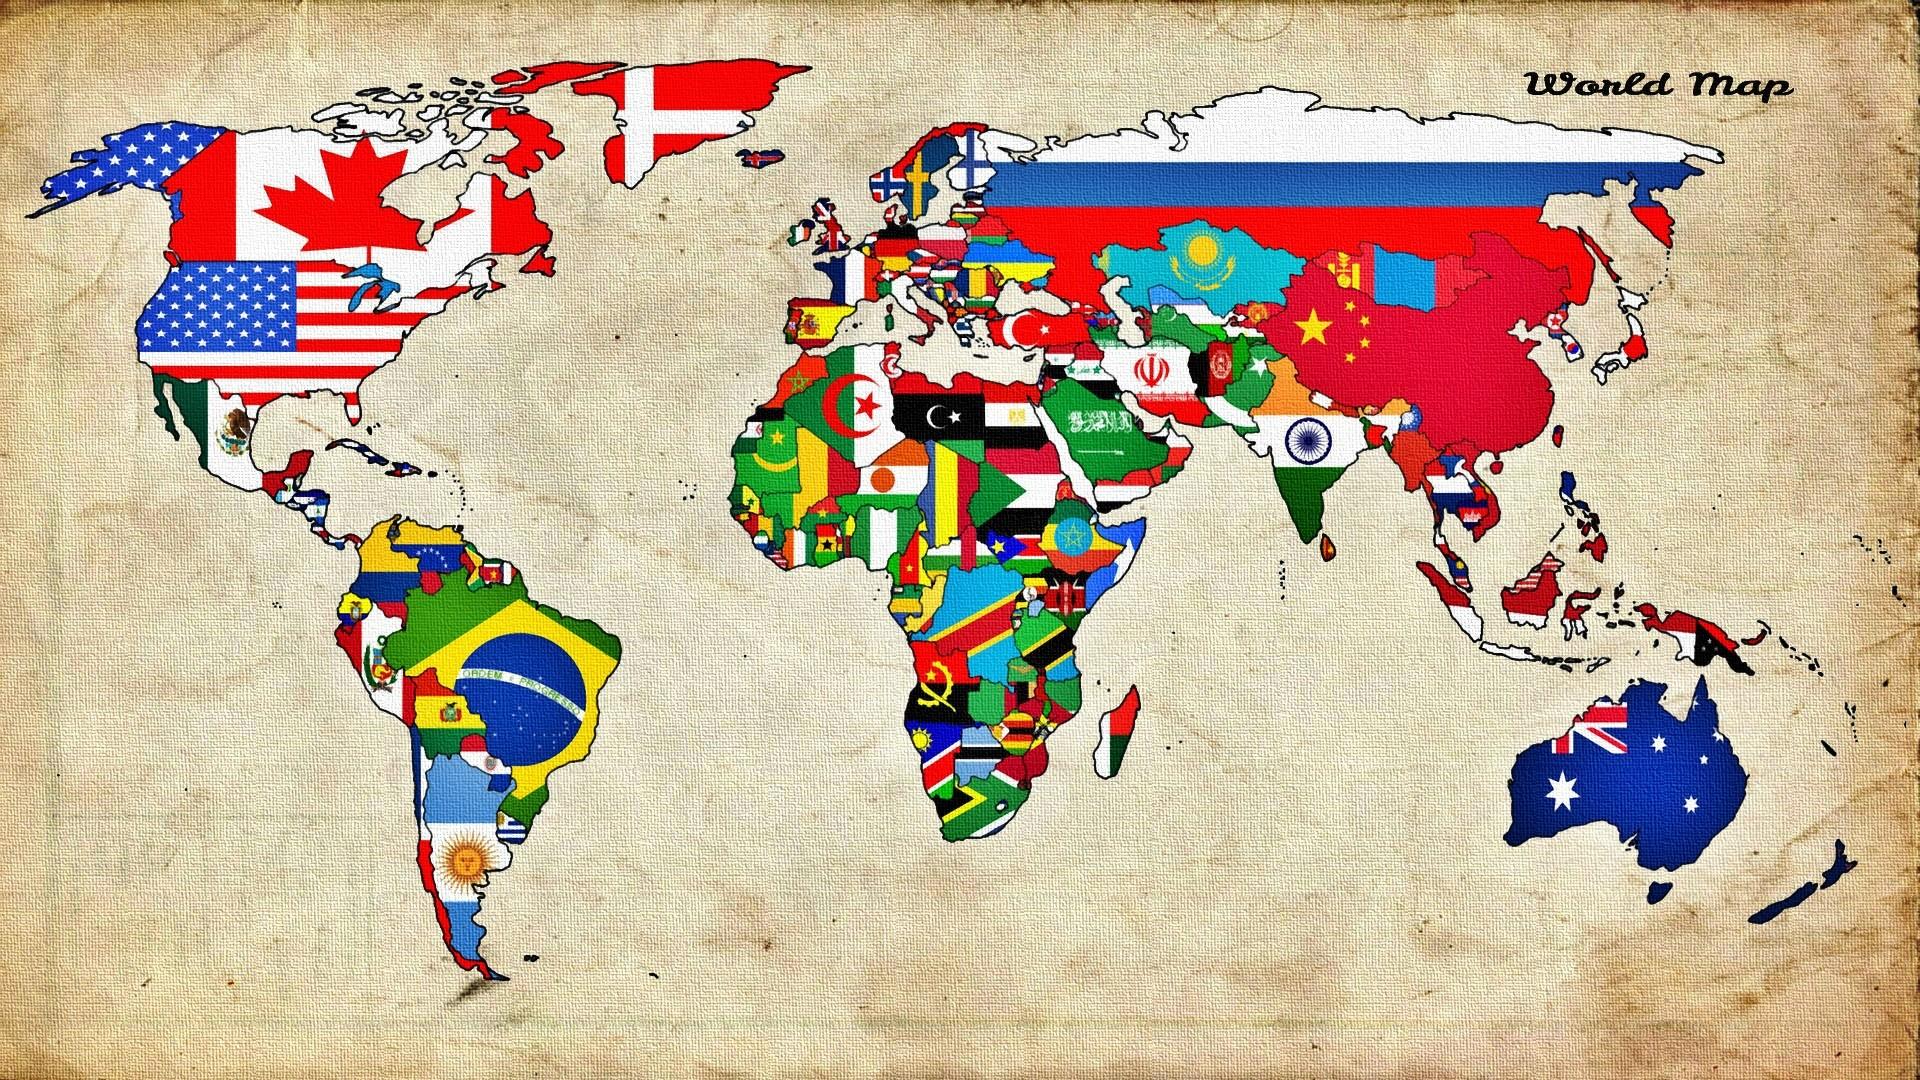 Wallpaper illustration flag world map countries mural art illustration flag world map countries mural art 1920x1080 px font child art gumiabroncs Gallery